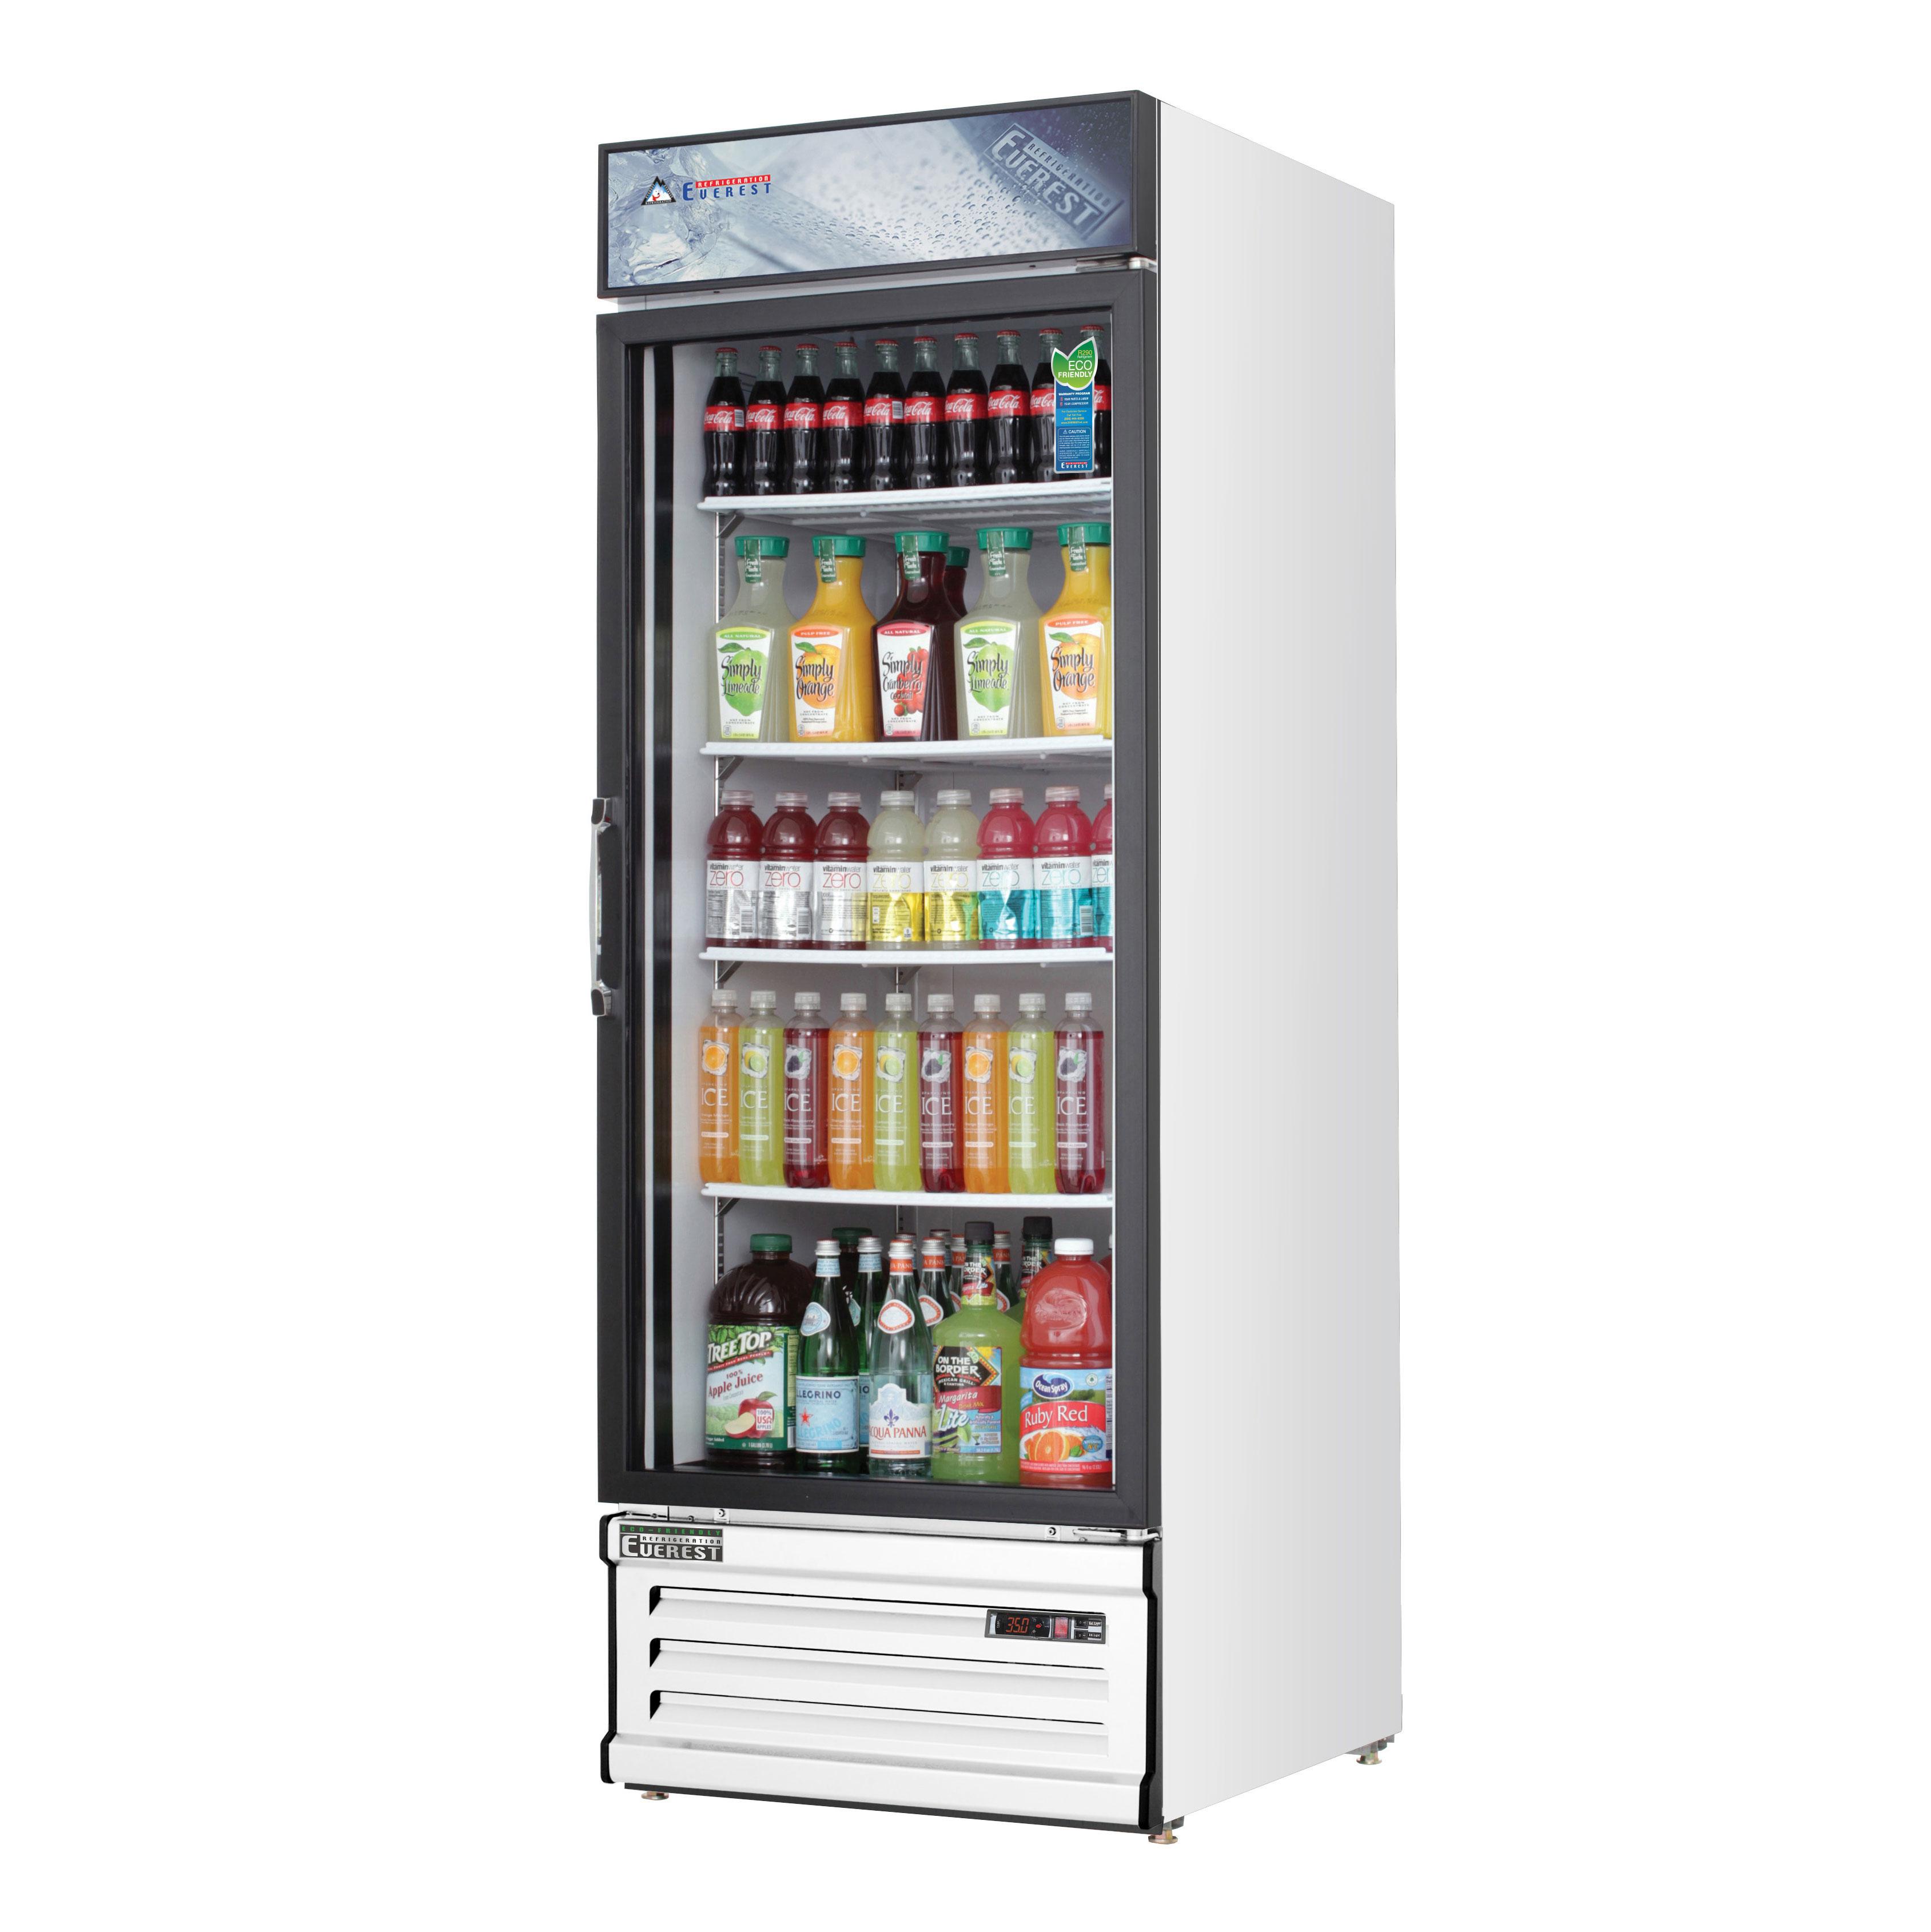 Everest Refrigeration EMGR24 refrigerator, merchandiser